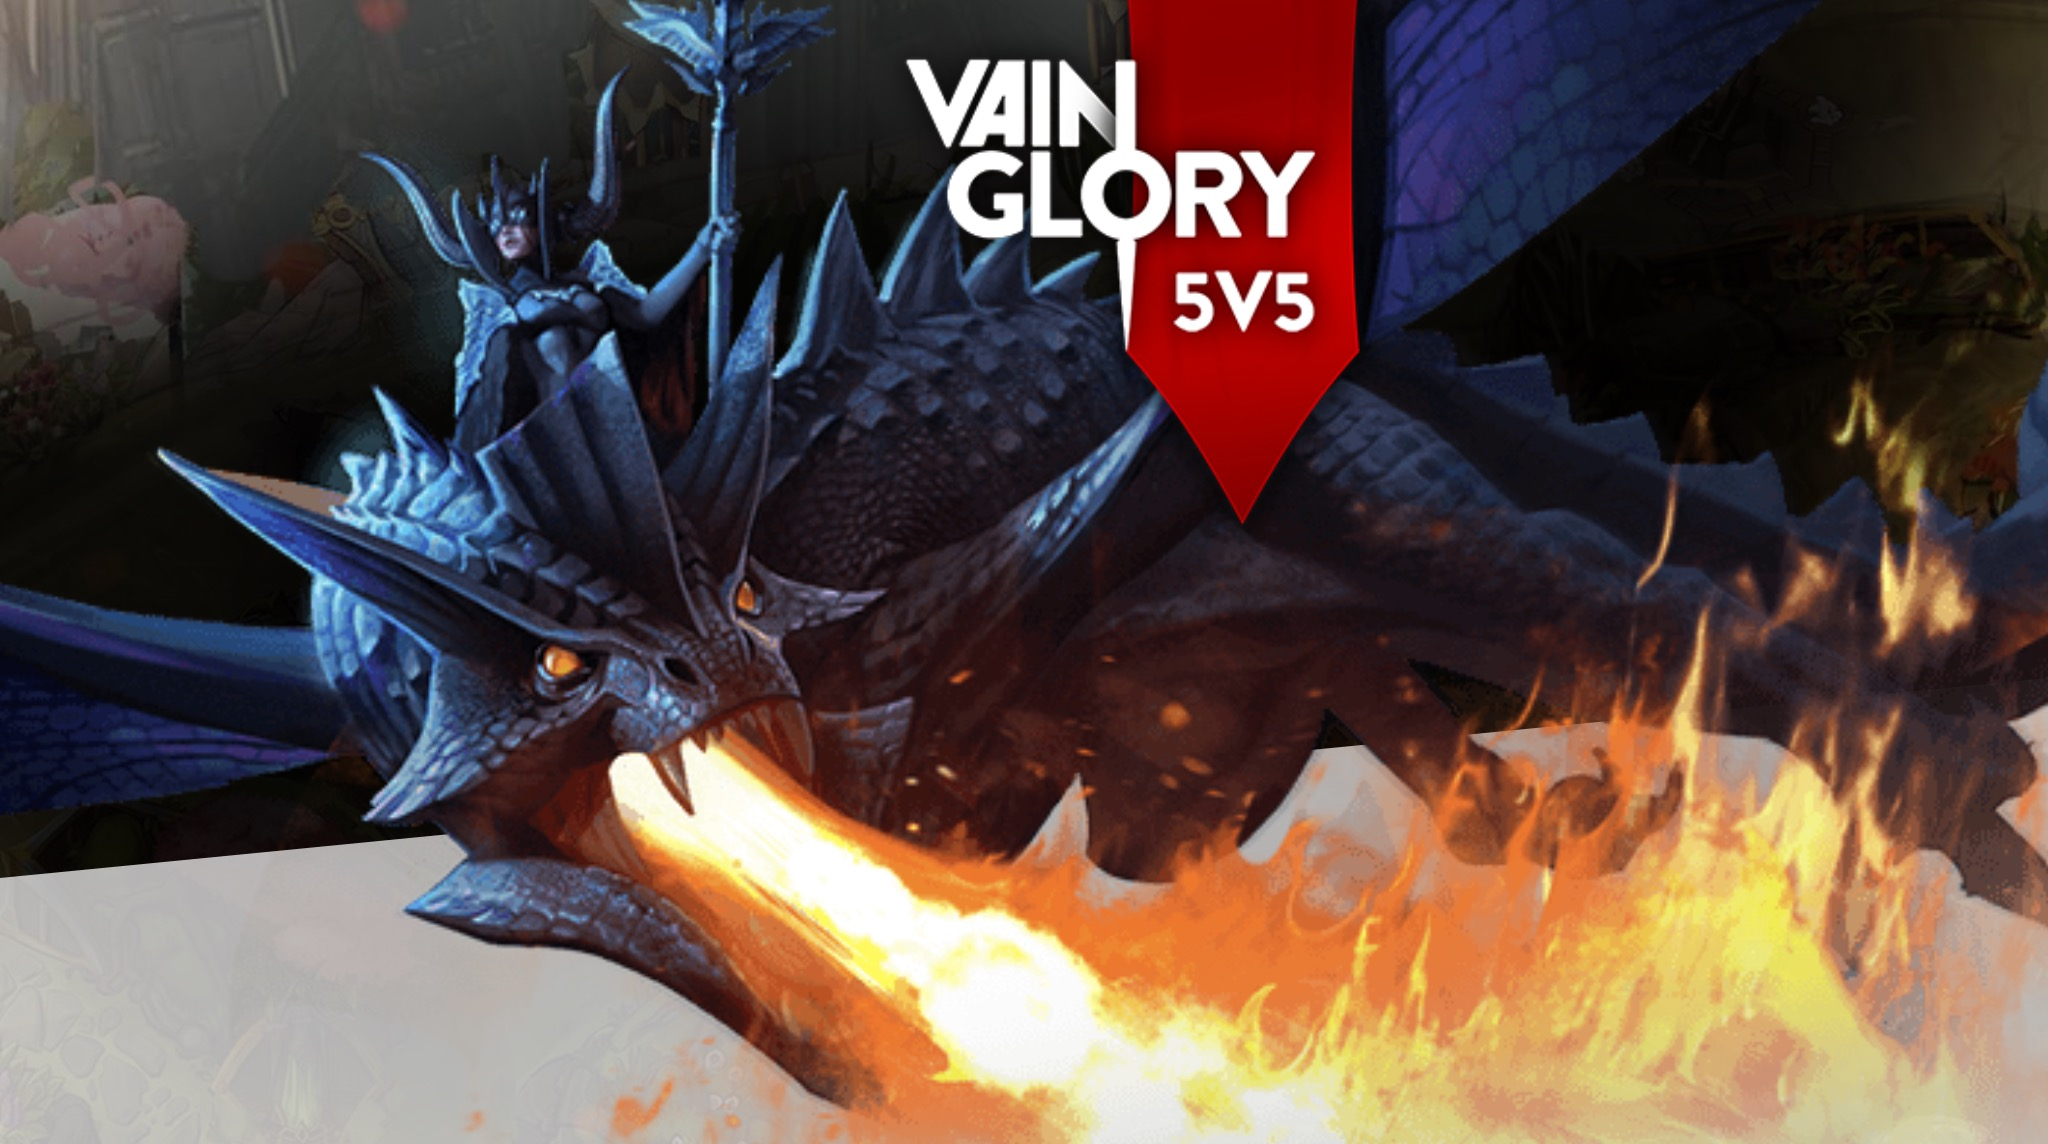 vainglory 5v5 beta